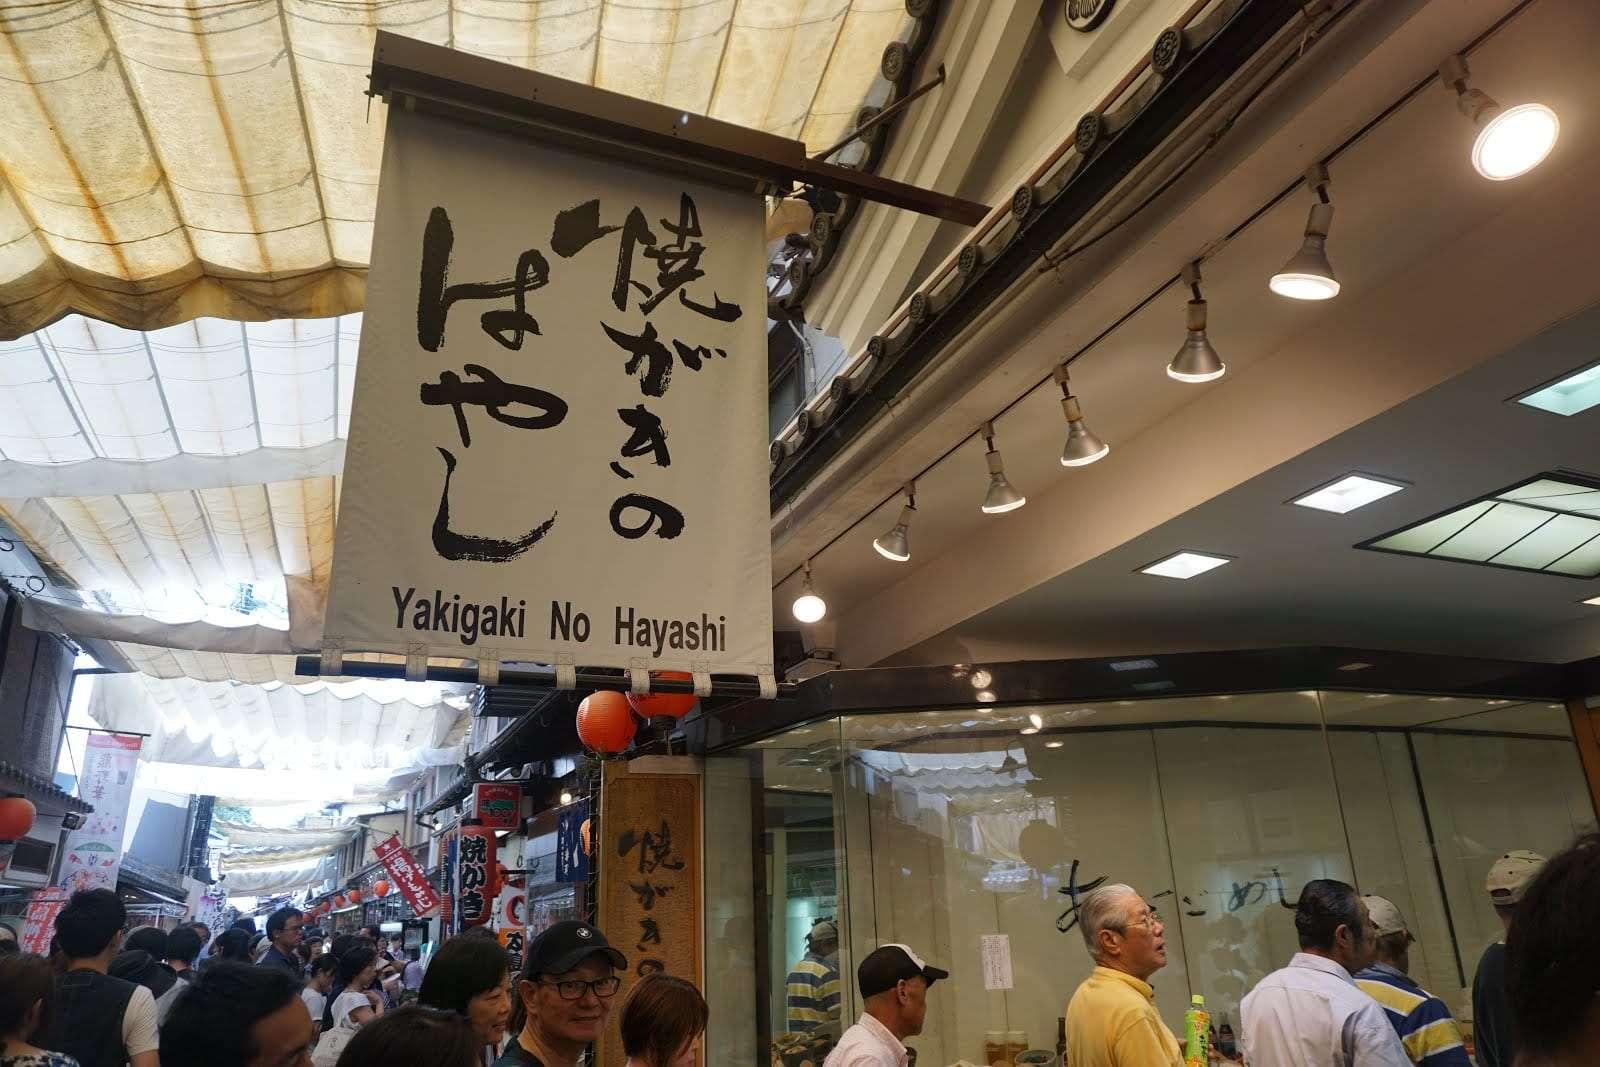 Miyajima Oysters, Yakigaki No Hayashi